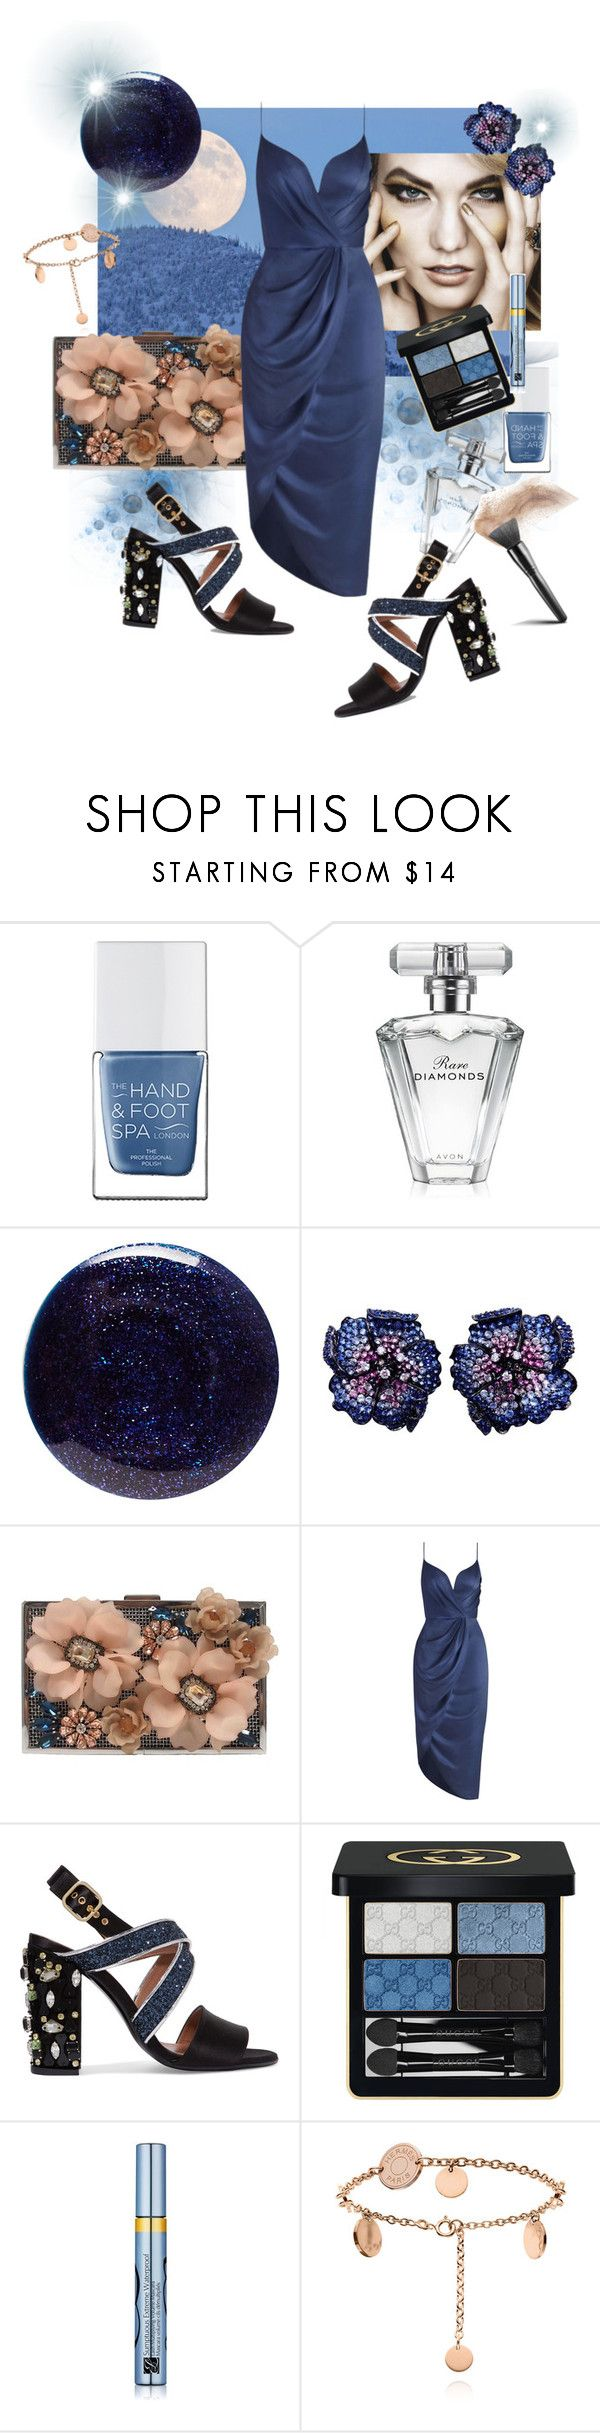 """So Blue, So Sexy"" by ohnoflo ❤ liked on Polyvore featuring The Hand & Foot Spa, Avon, Lauren B. Beauty, La Fleur Jewels, Sondra Roberts, Zimmermann, Marni, Gucci, Estée Lauder and chloe"